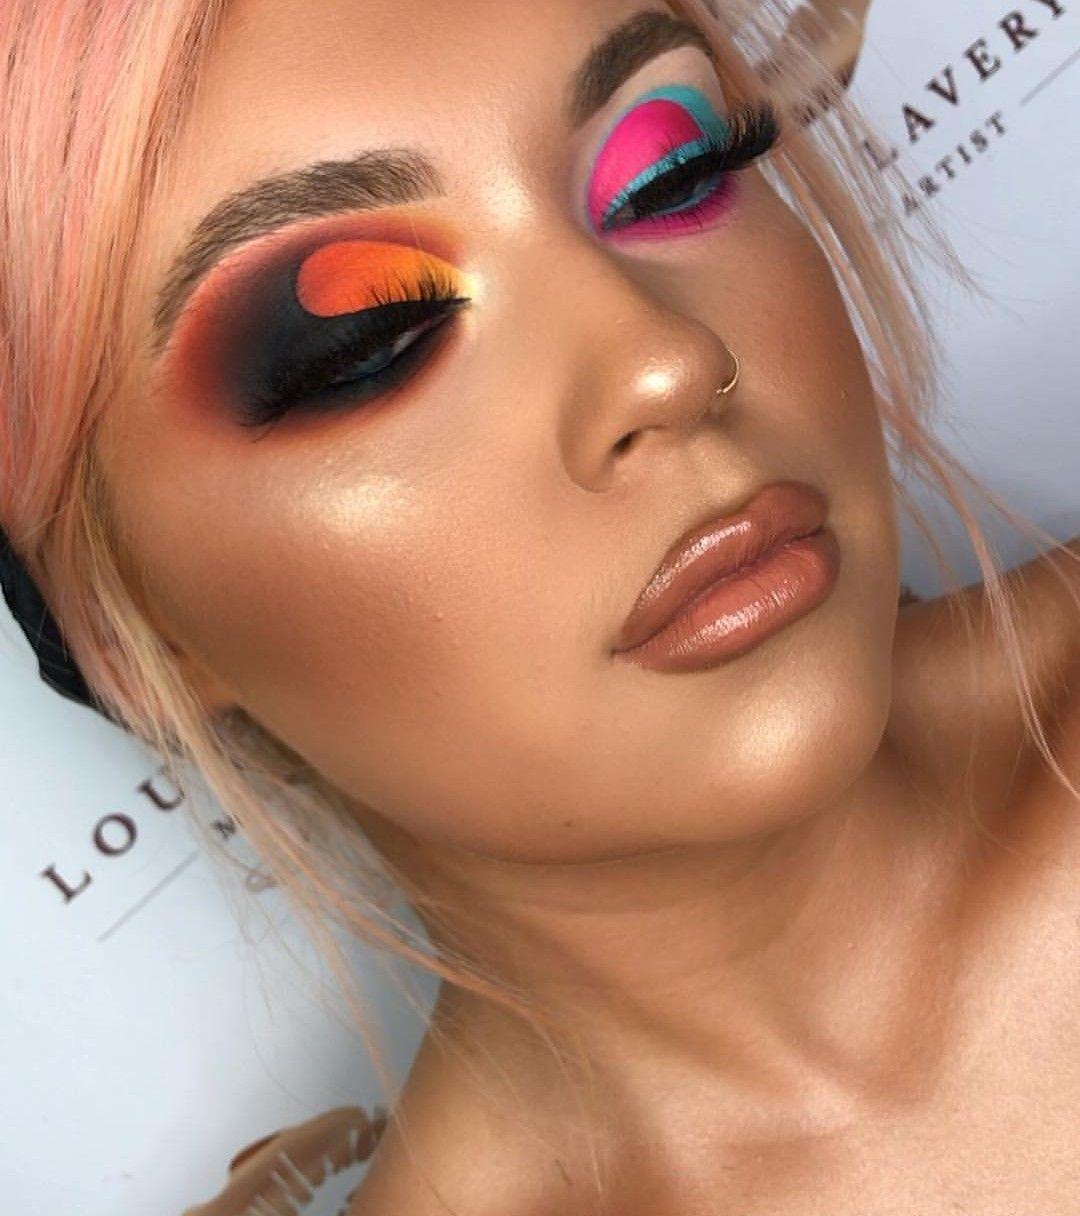 Ъεℓℓค Ъℓεรรε∂ ⋆⊰ Makeup inspiration, Fashion makeup, Makeup